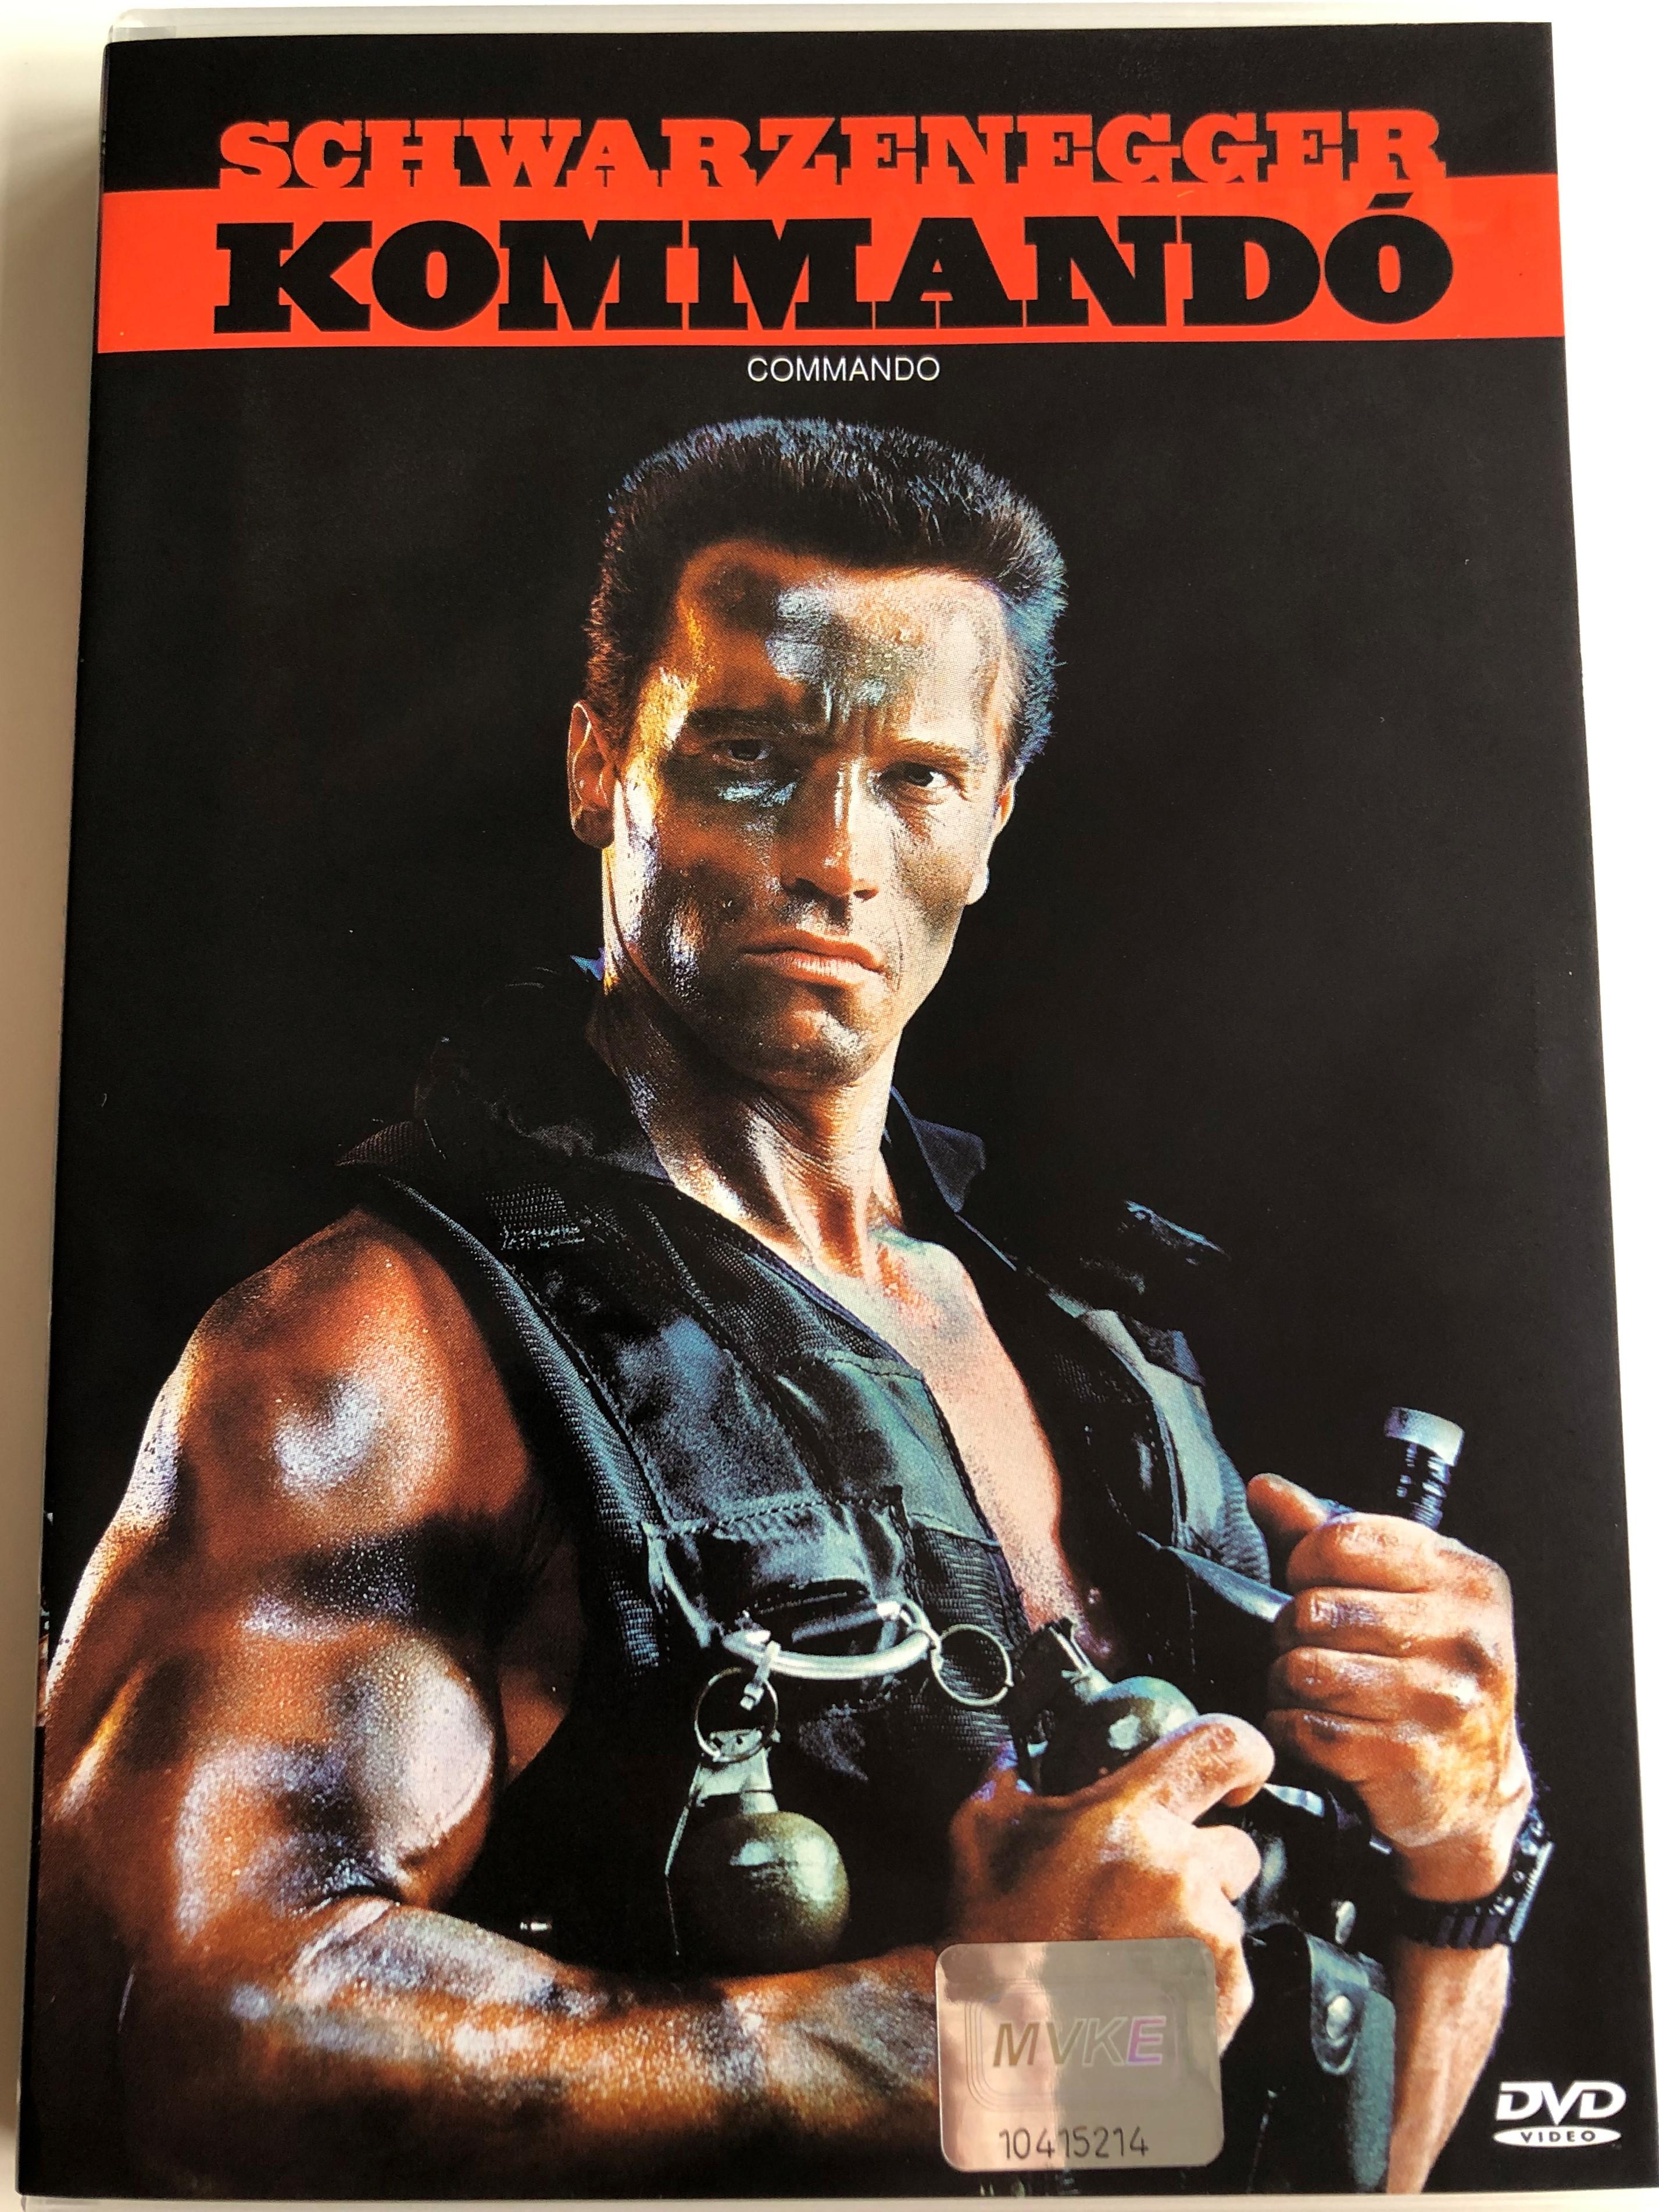 commando-dvd-1985-kommand-directed-by-mark-l.-lester-starring-arnold-schwarzenegger-rae-dawn-chong-vernon-wells-dan-hedaya-alyssa-milano-james-olson-1-.jpg